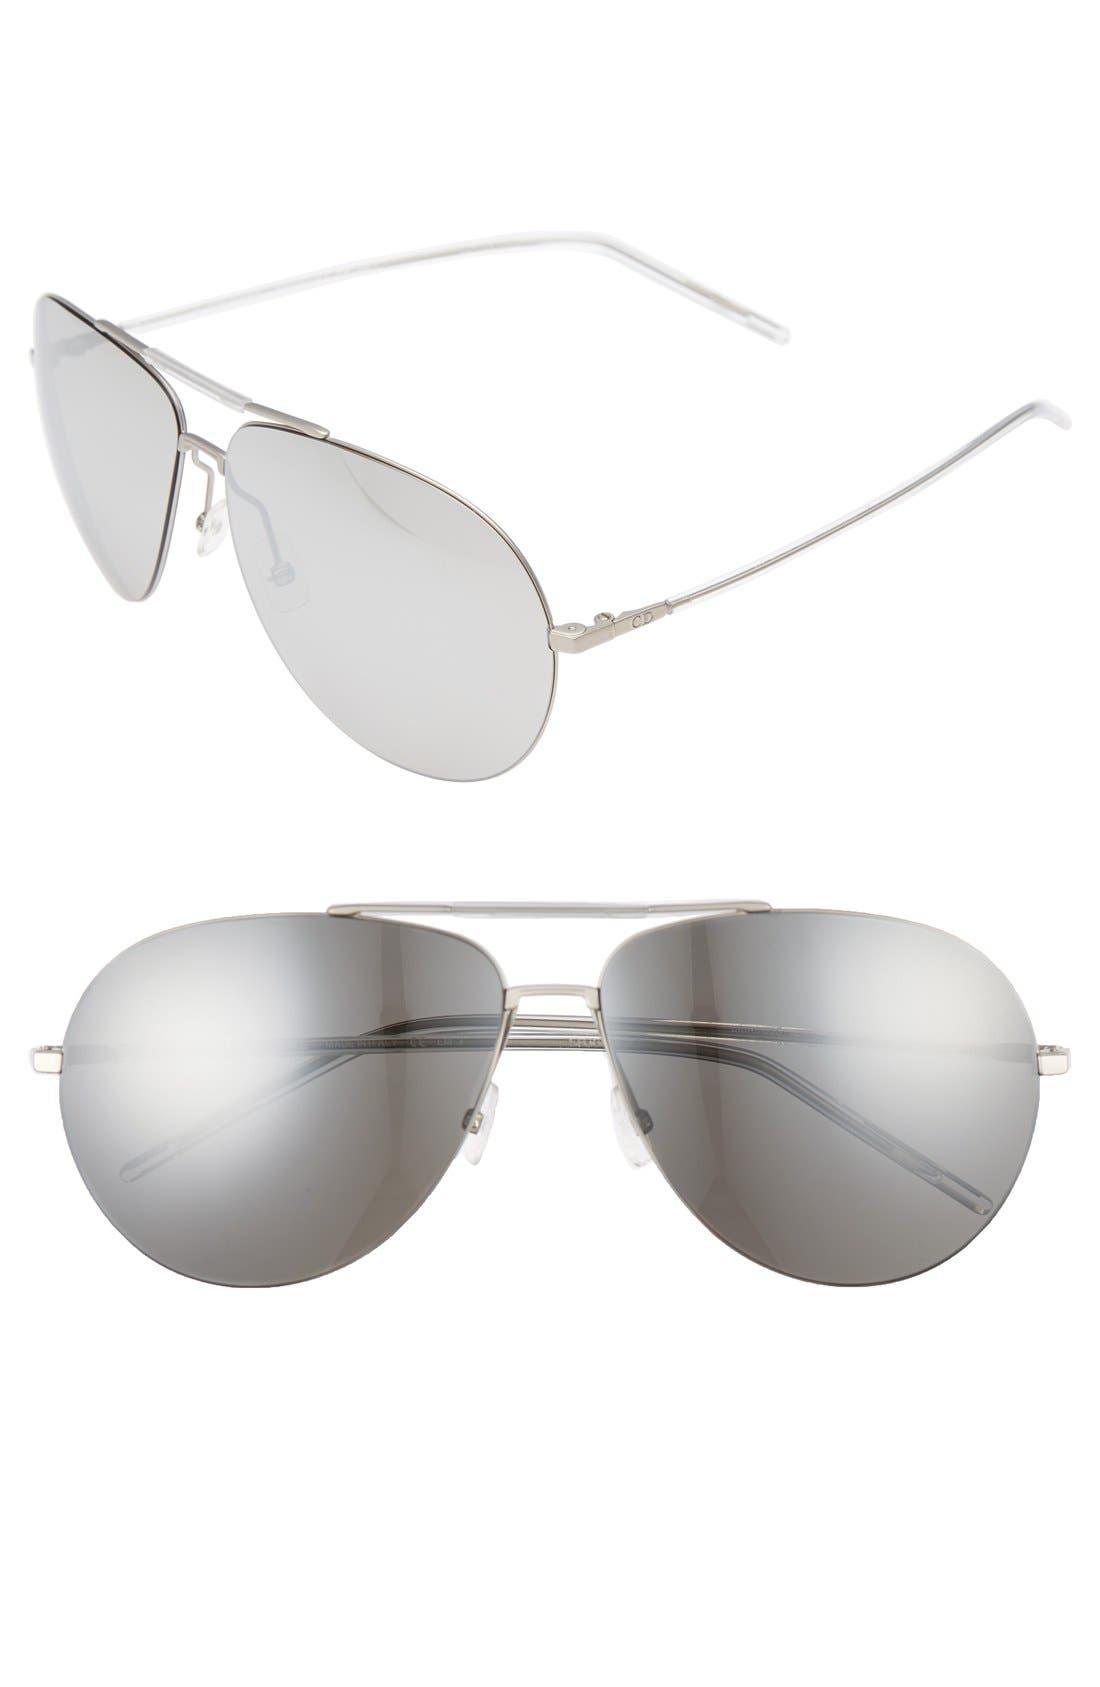 62mm Aviator Sunglasses,                             Main thumbnail 2, color,